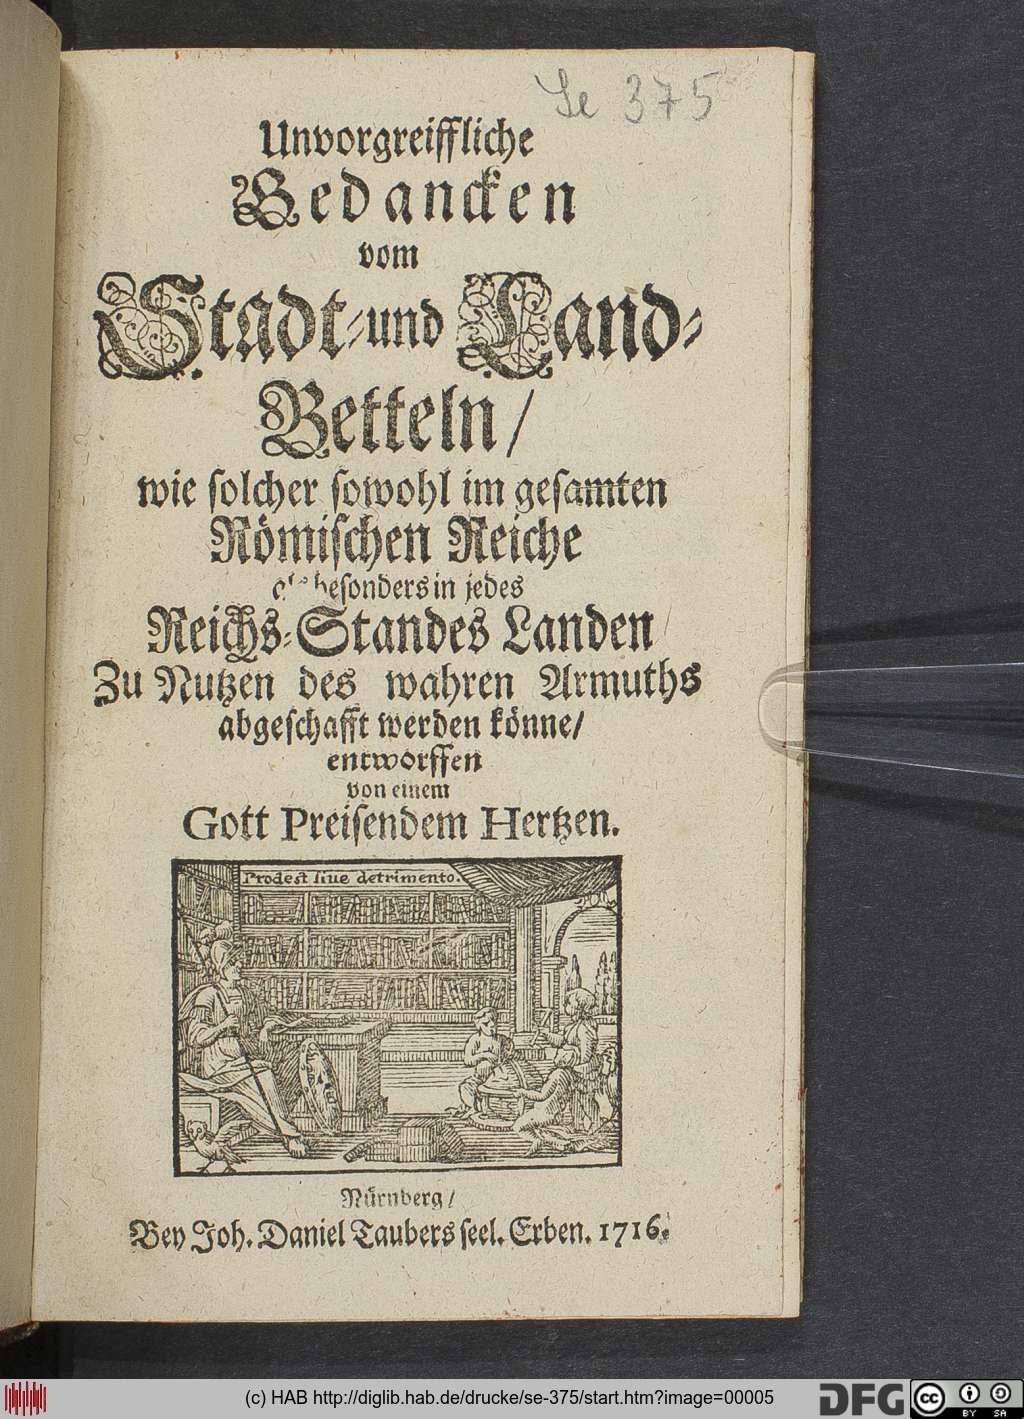 http://diglib.hab.de/drucke/se-375/00005.jpg